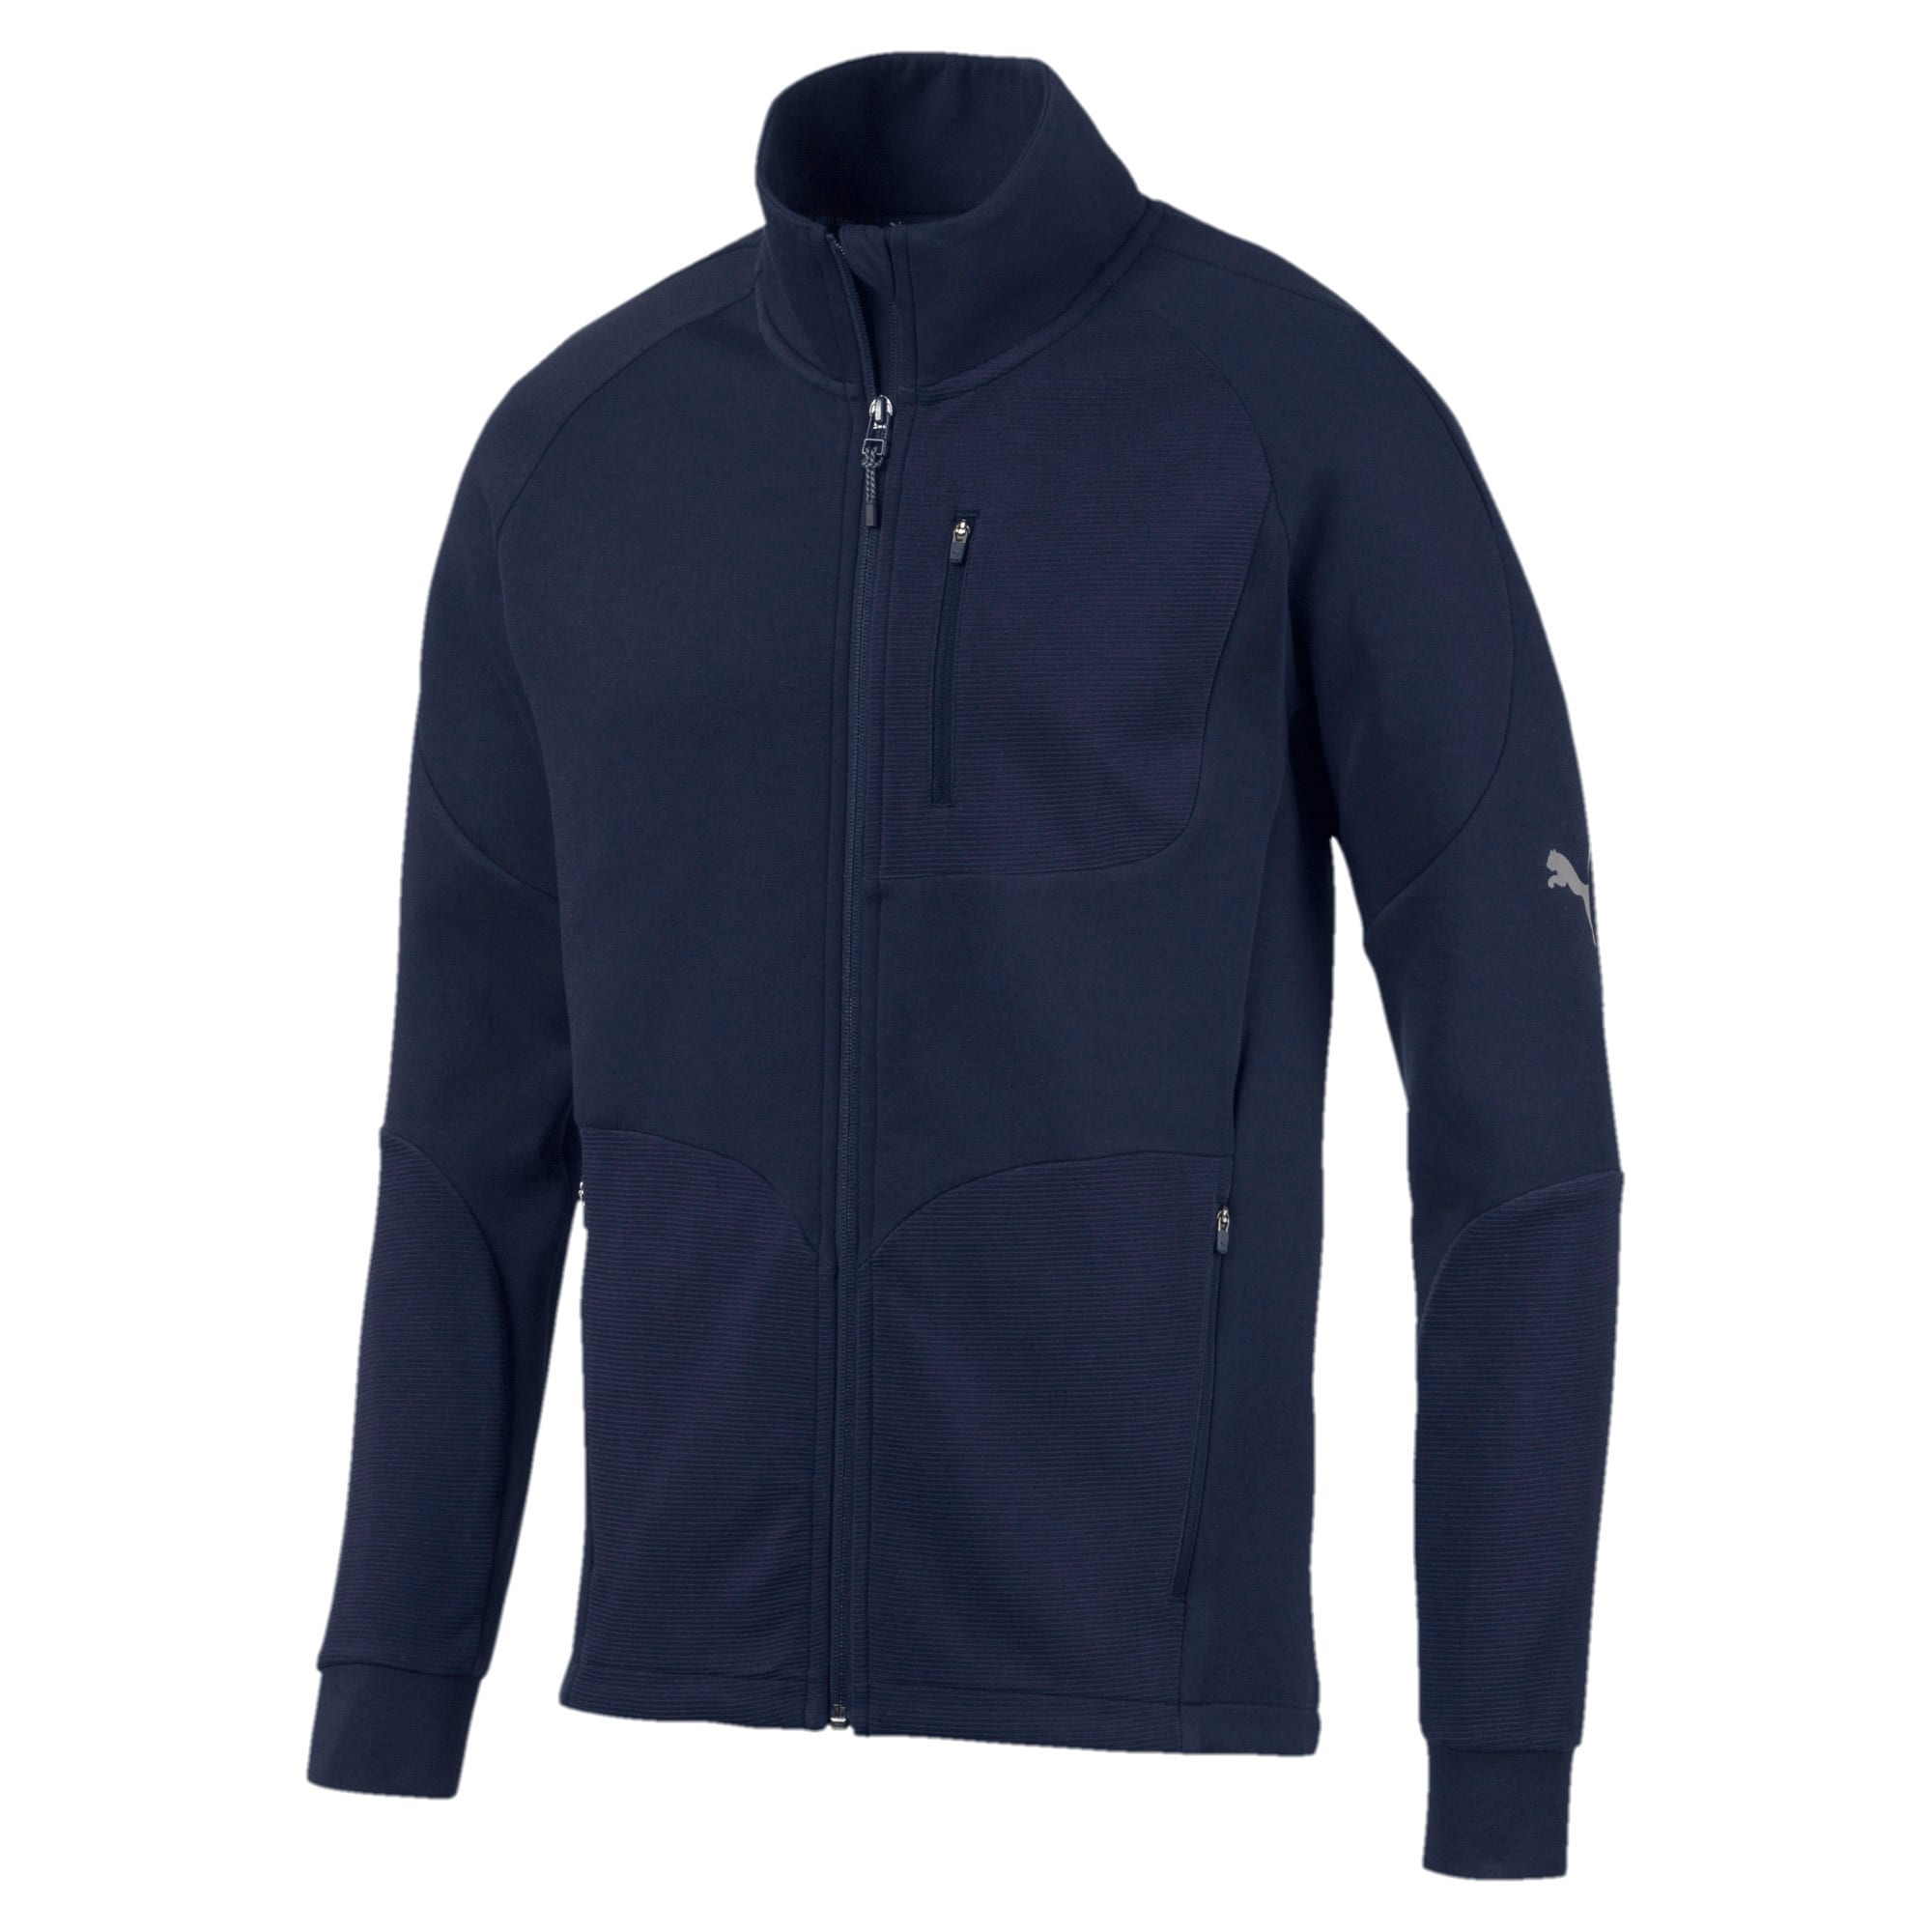 Thumbnail 4 of Evostripe Long Sleeve Men's Jacket, Peacoat, medium